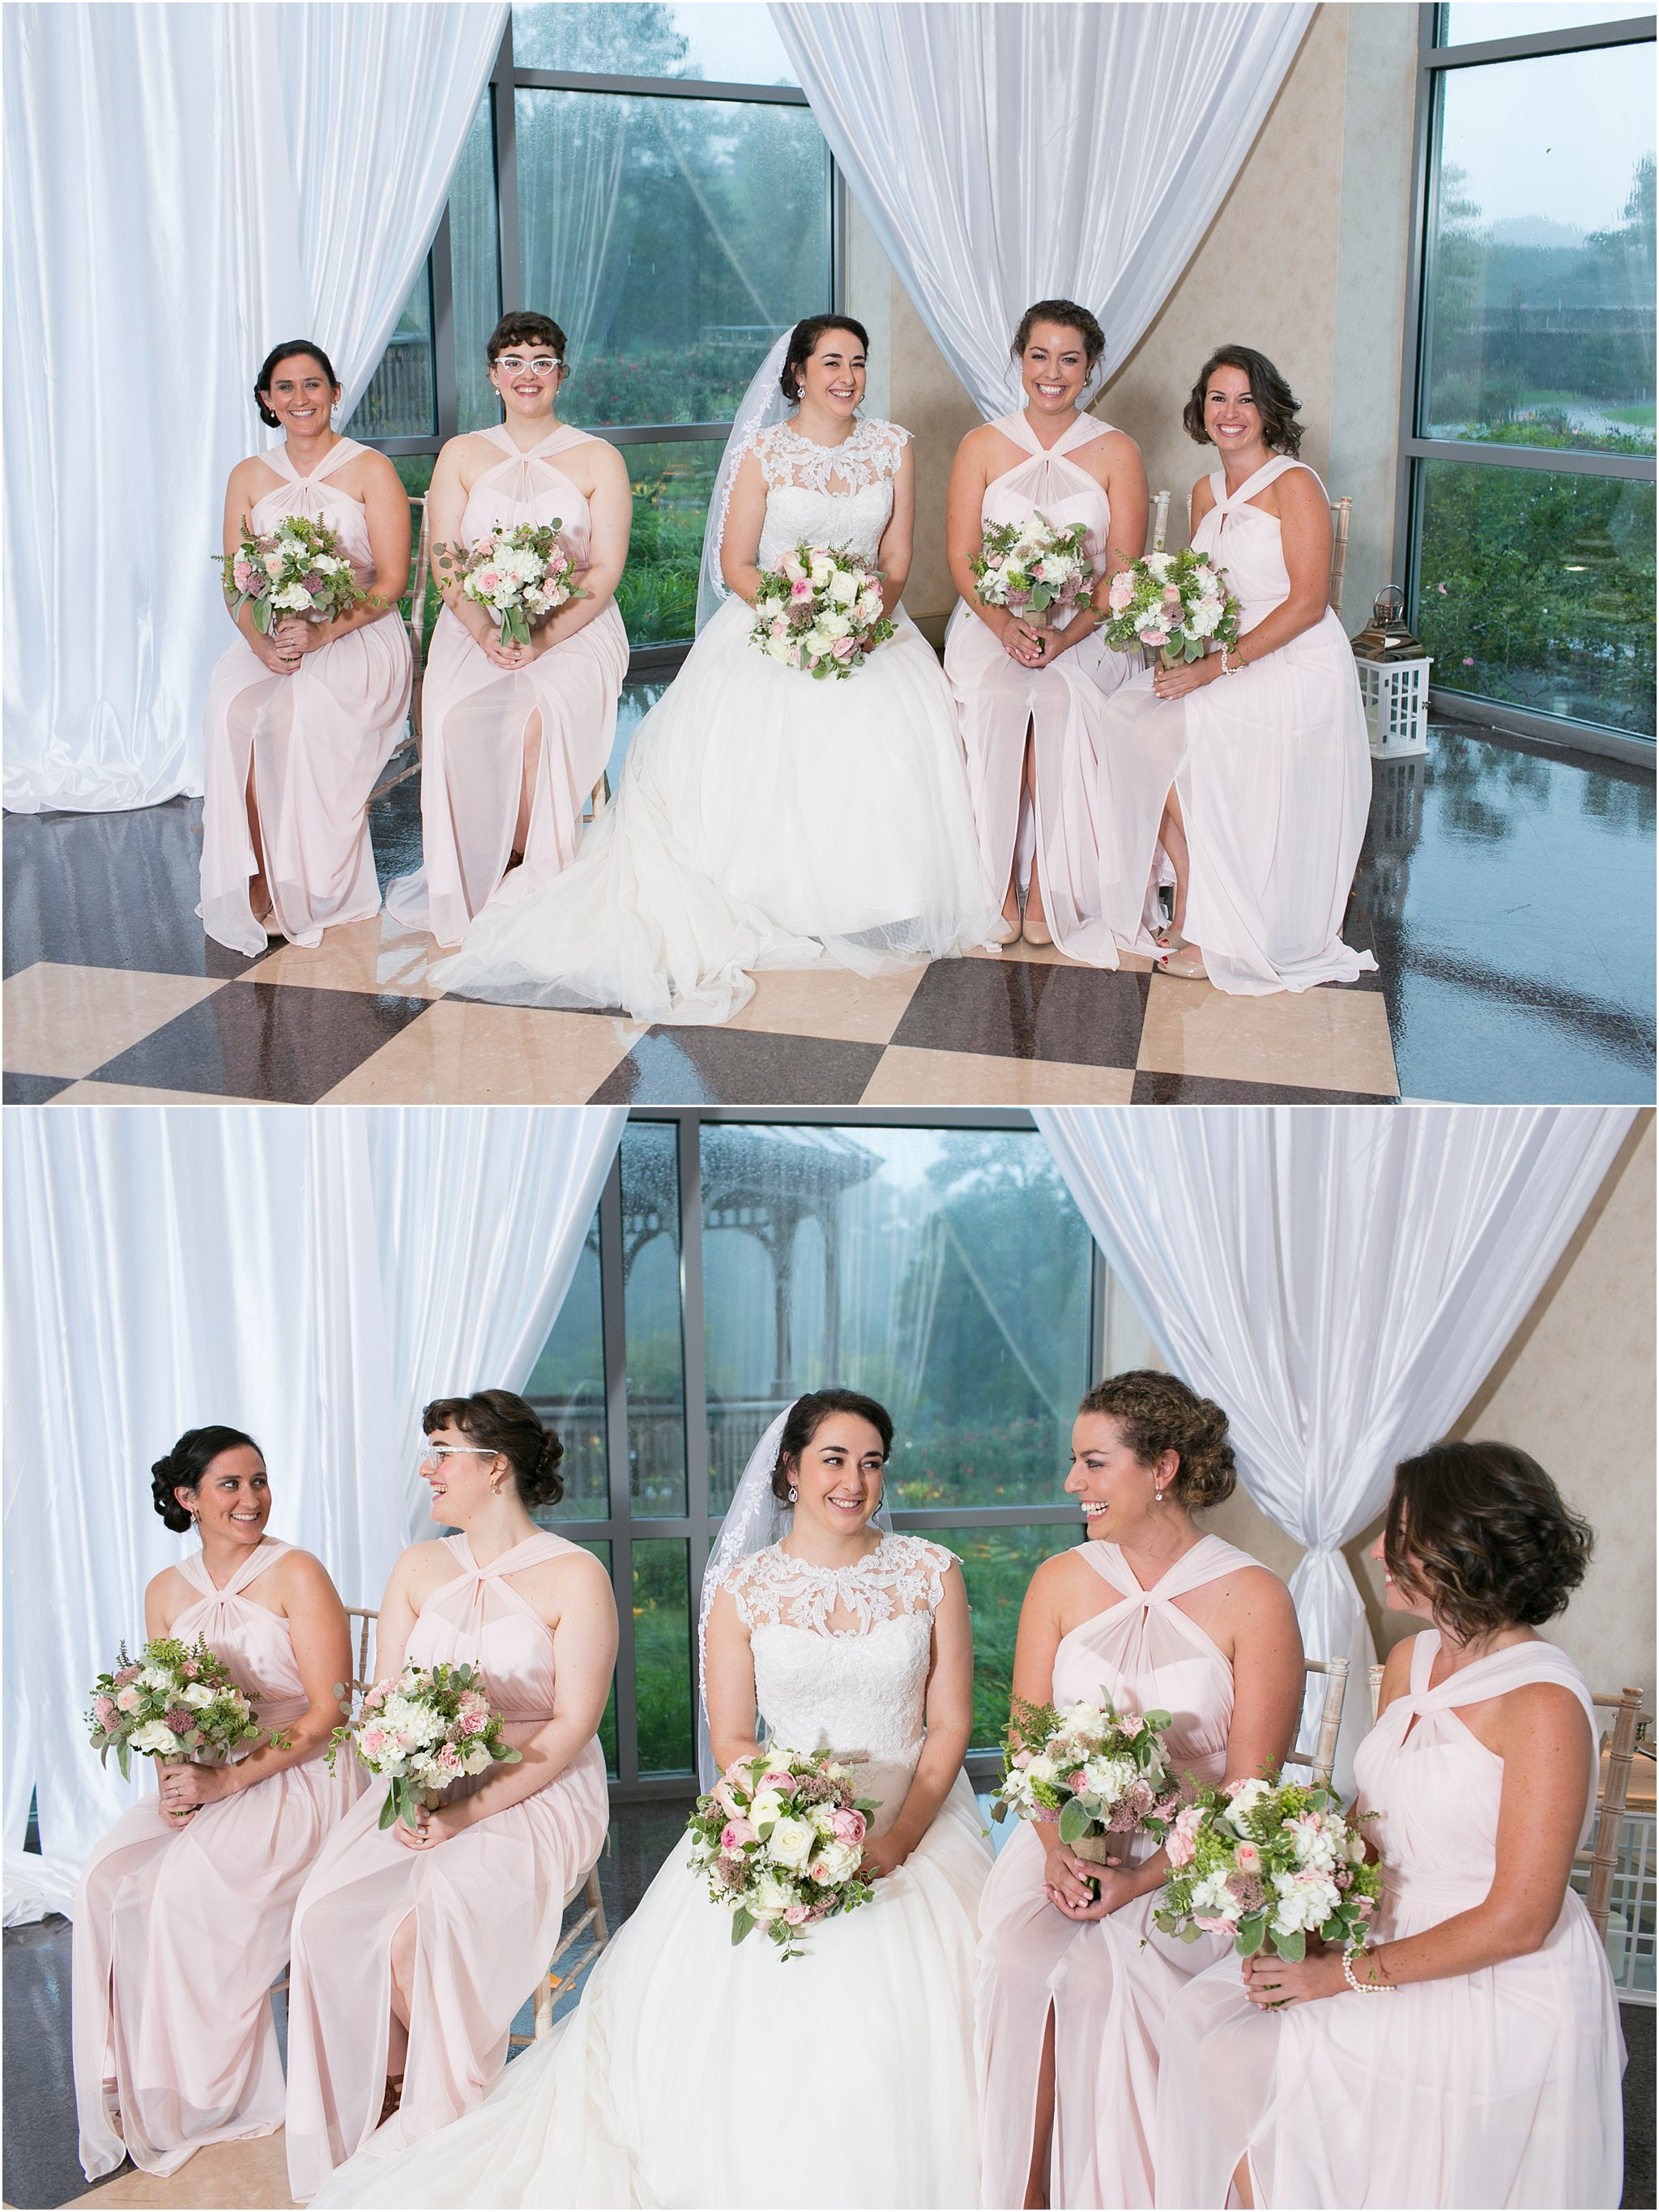 jessica_ryan_photography_virginia_wedding_photographer_wedding_hurricane_norfolk_botanical_gardens_hurricane_matthew_wedding_3579